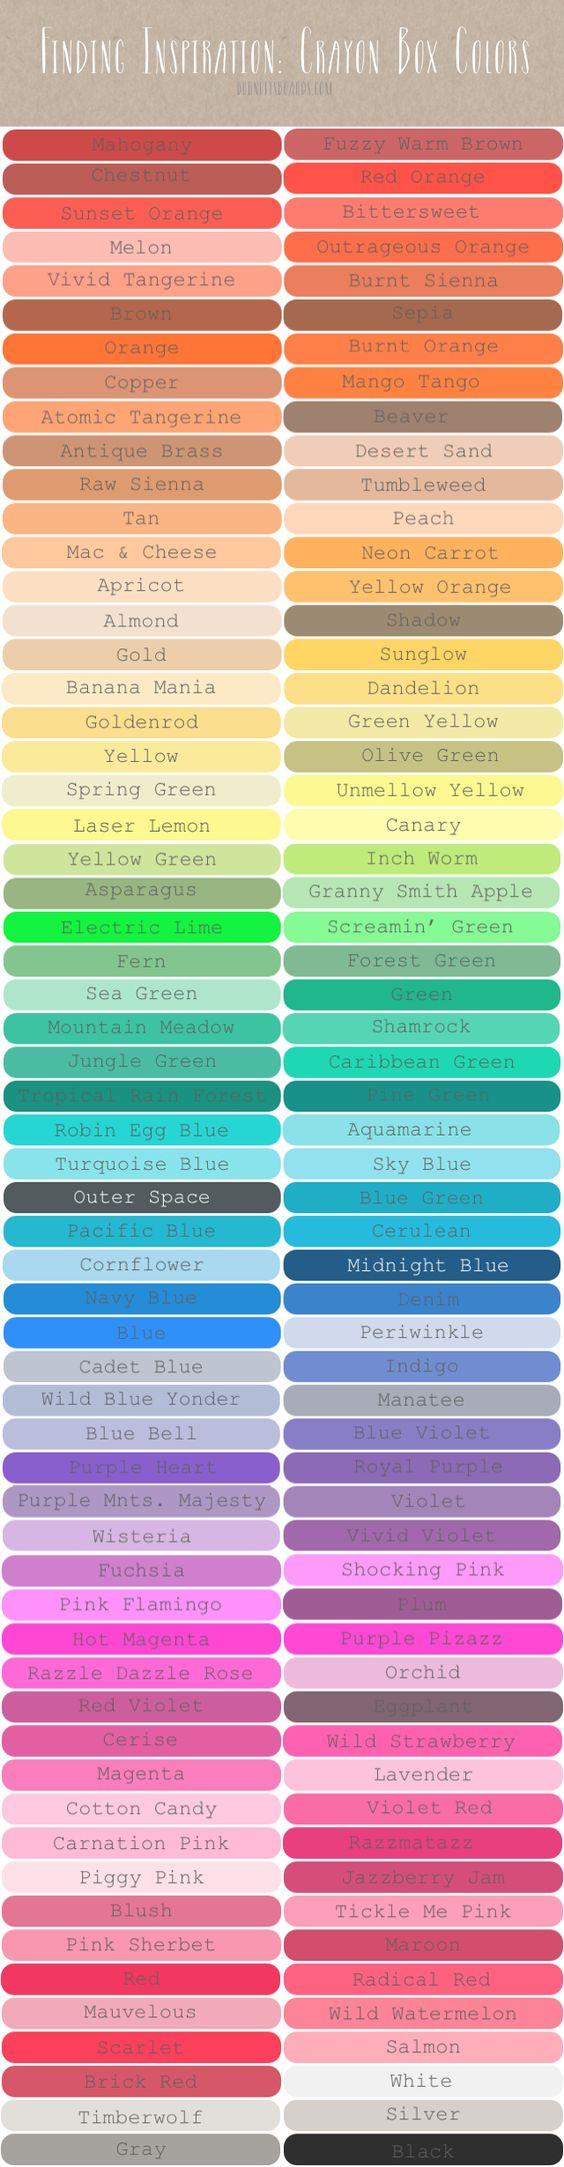 Rainbow Connection Handy Color Charts Gcu Community